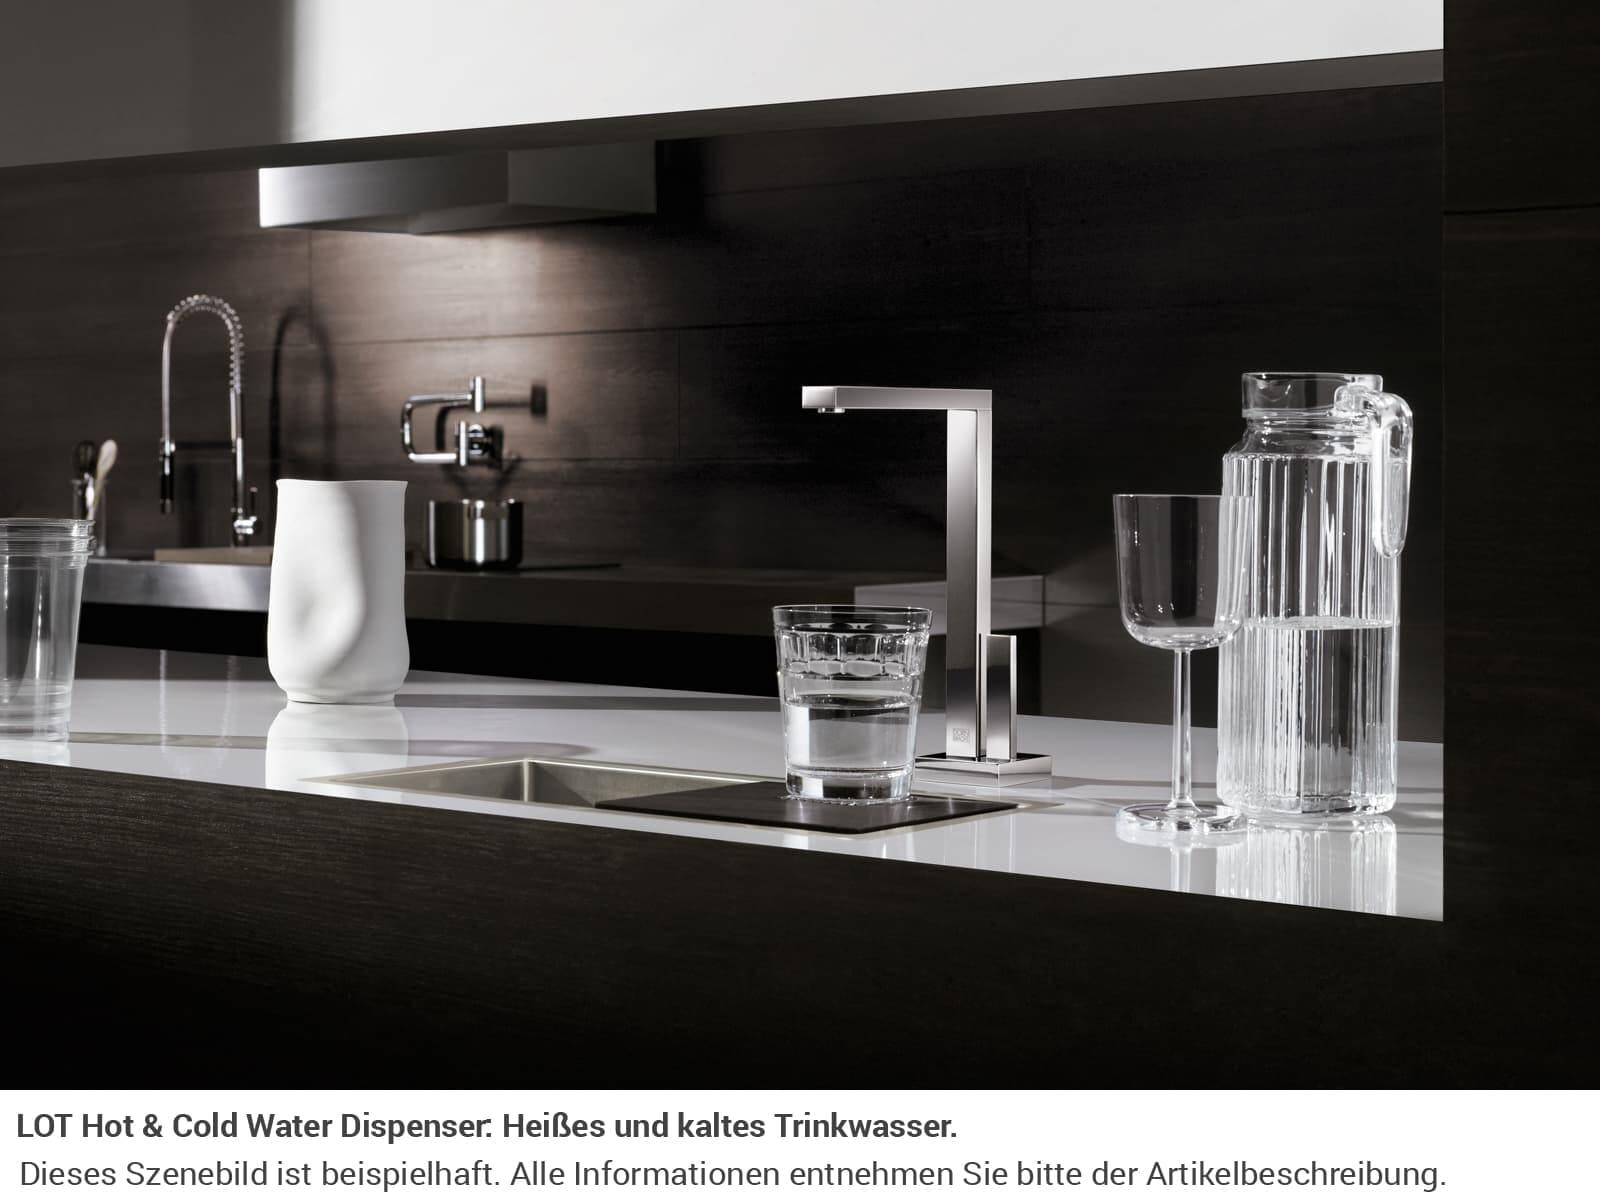 Dornbracht Lot Hot & Cold Water Dispenser Platin Matt 17 861 680-06 Hochdruckarmatur